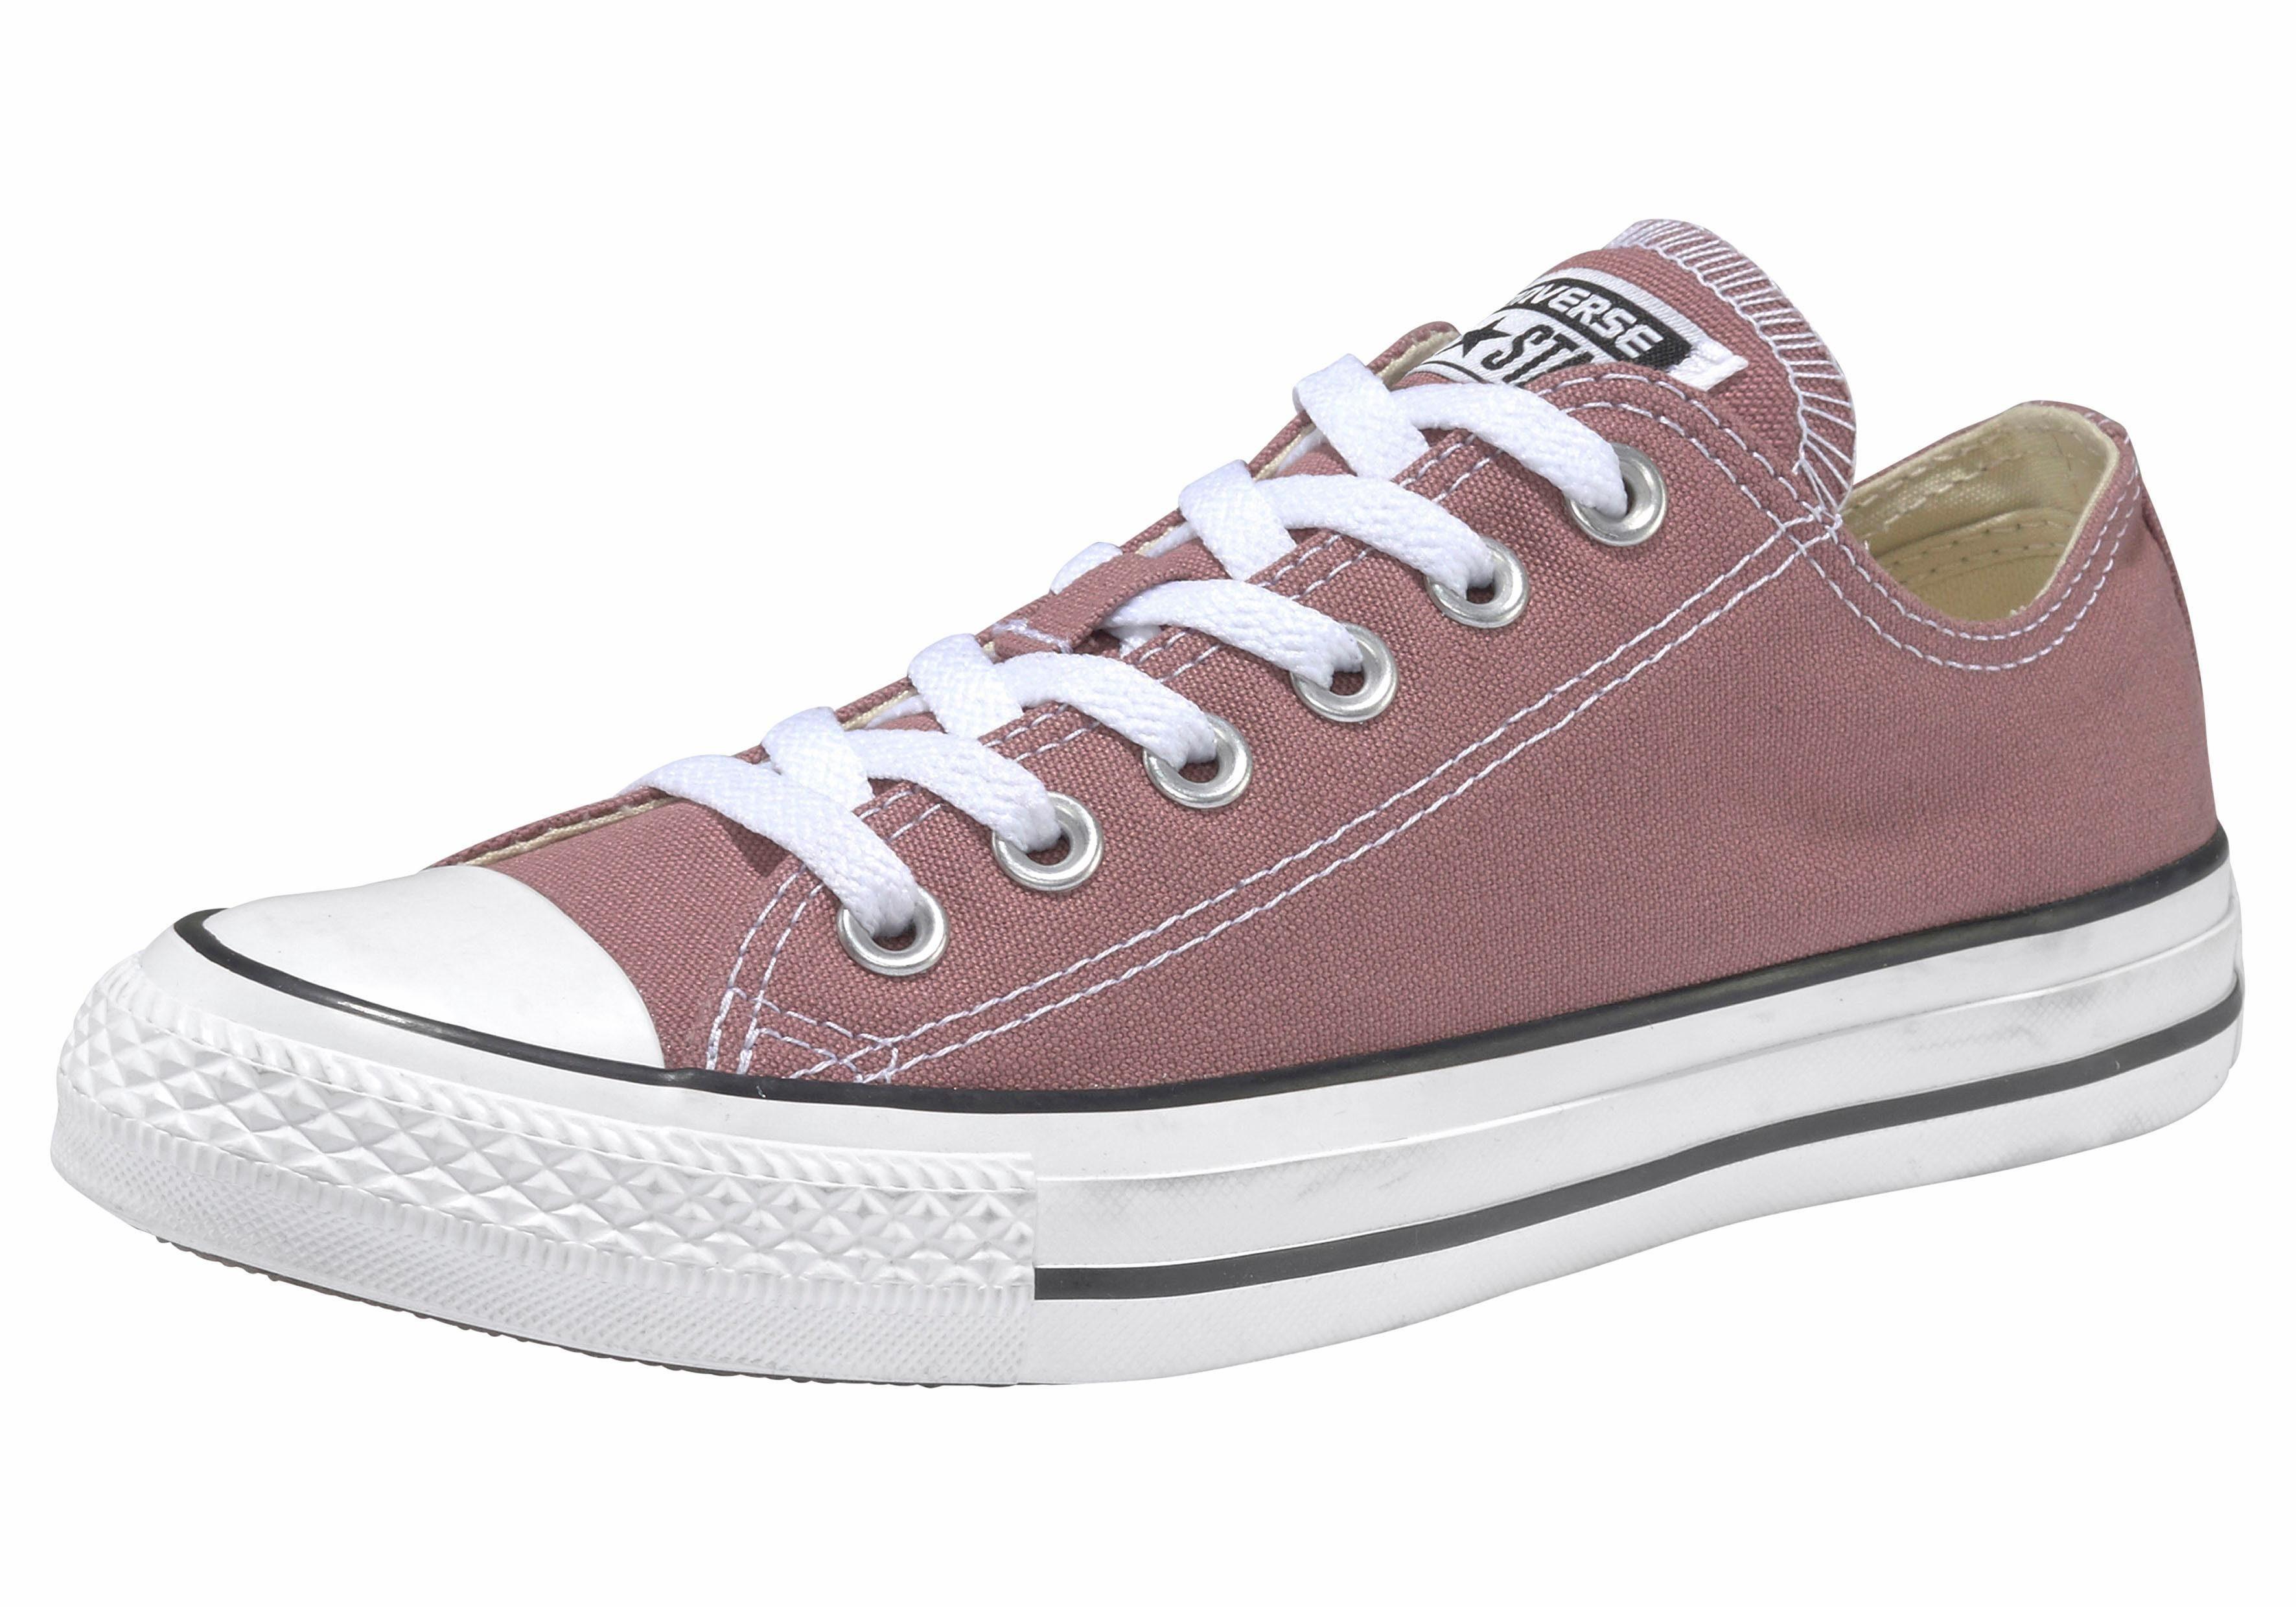 Brun Chaussures Converse All Star Ox X1Gzm9B